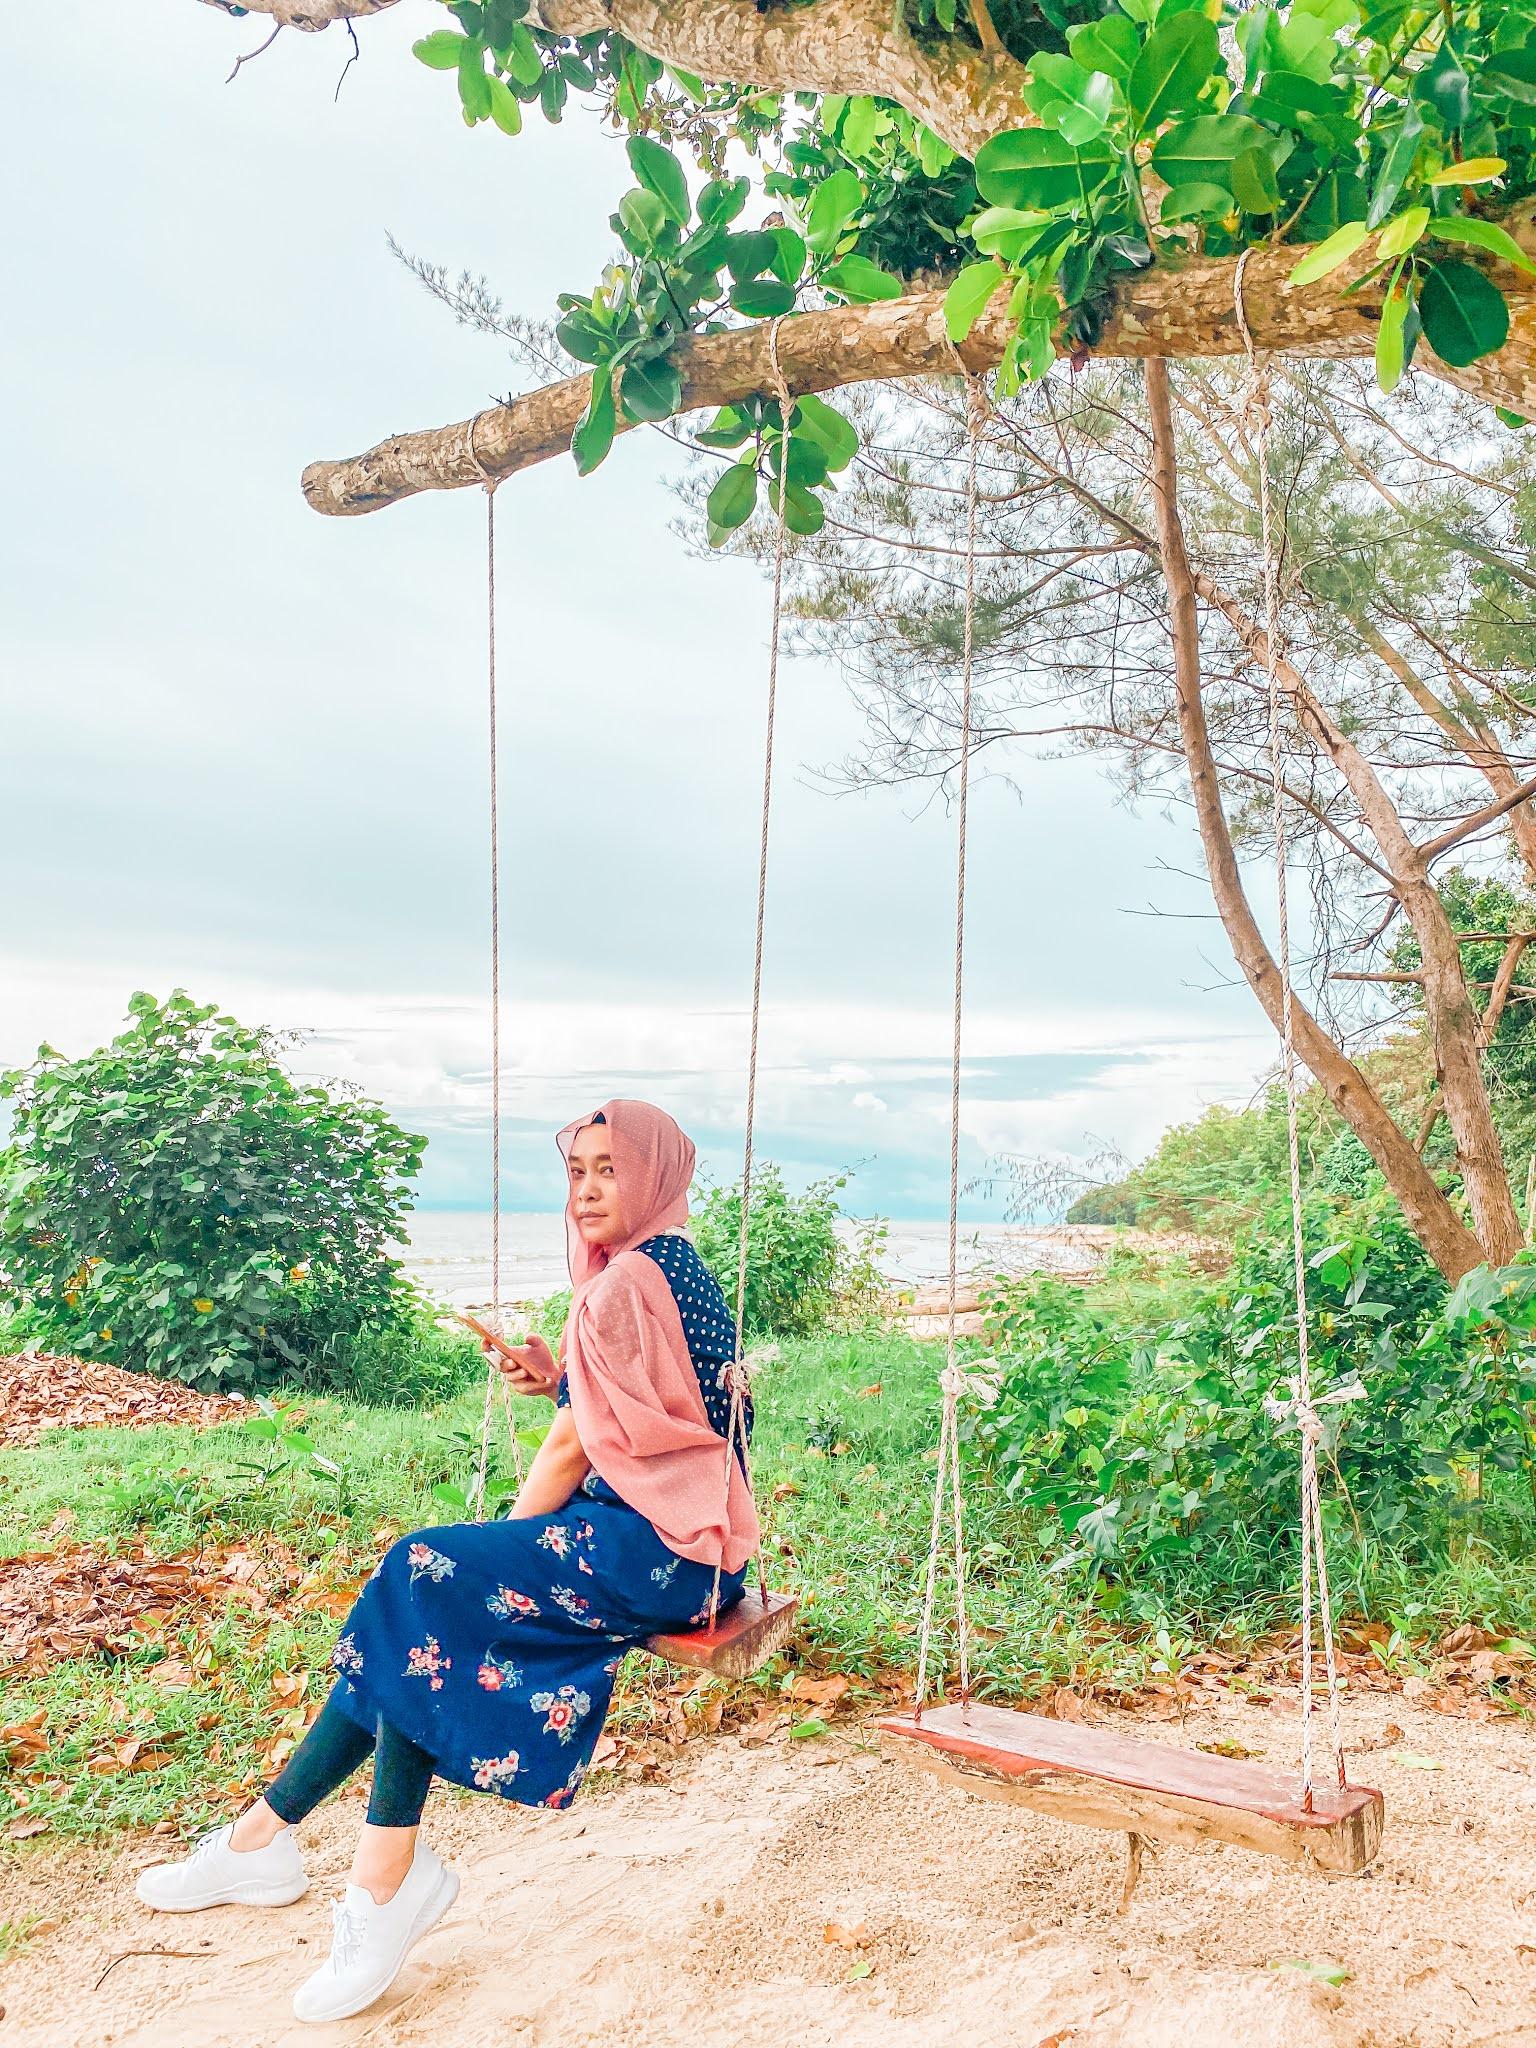 Blue Eyes Beach Resort, Kuala Penyu, Sabah